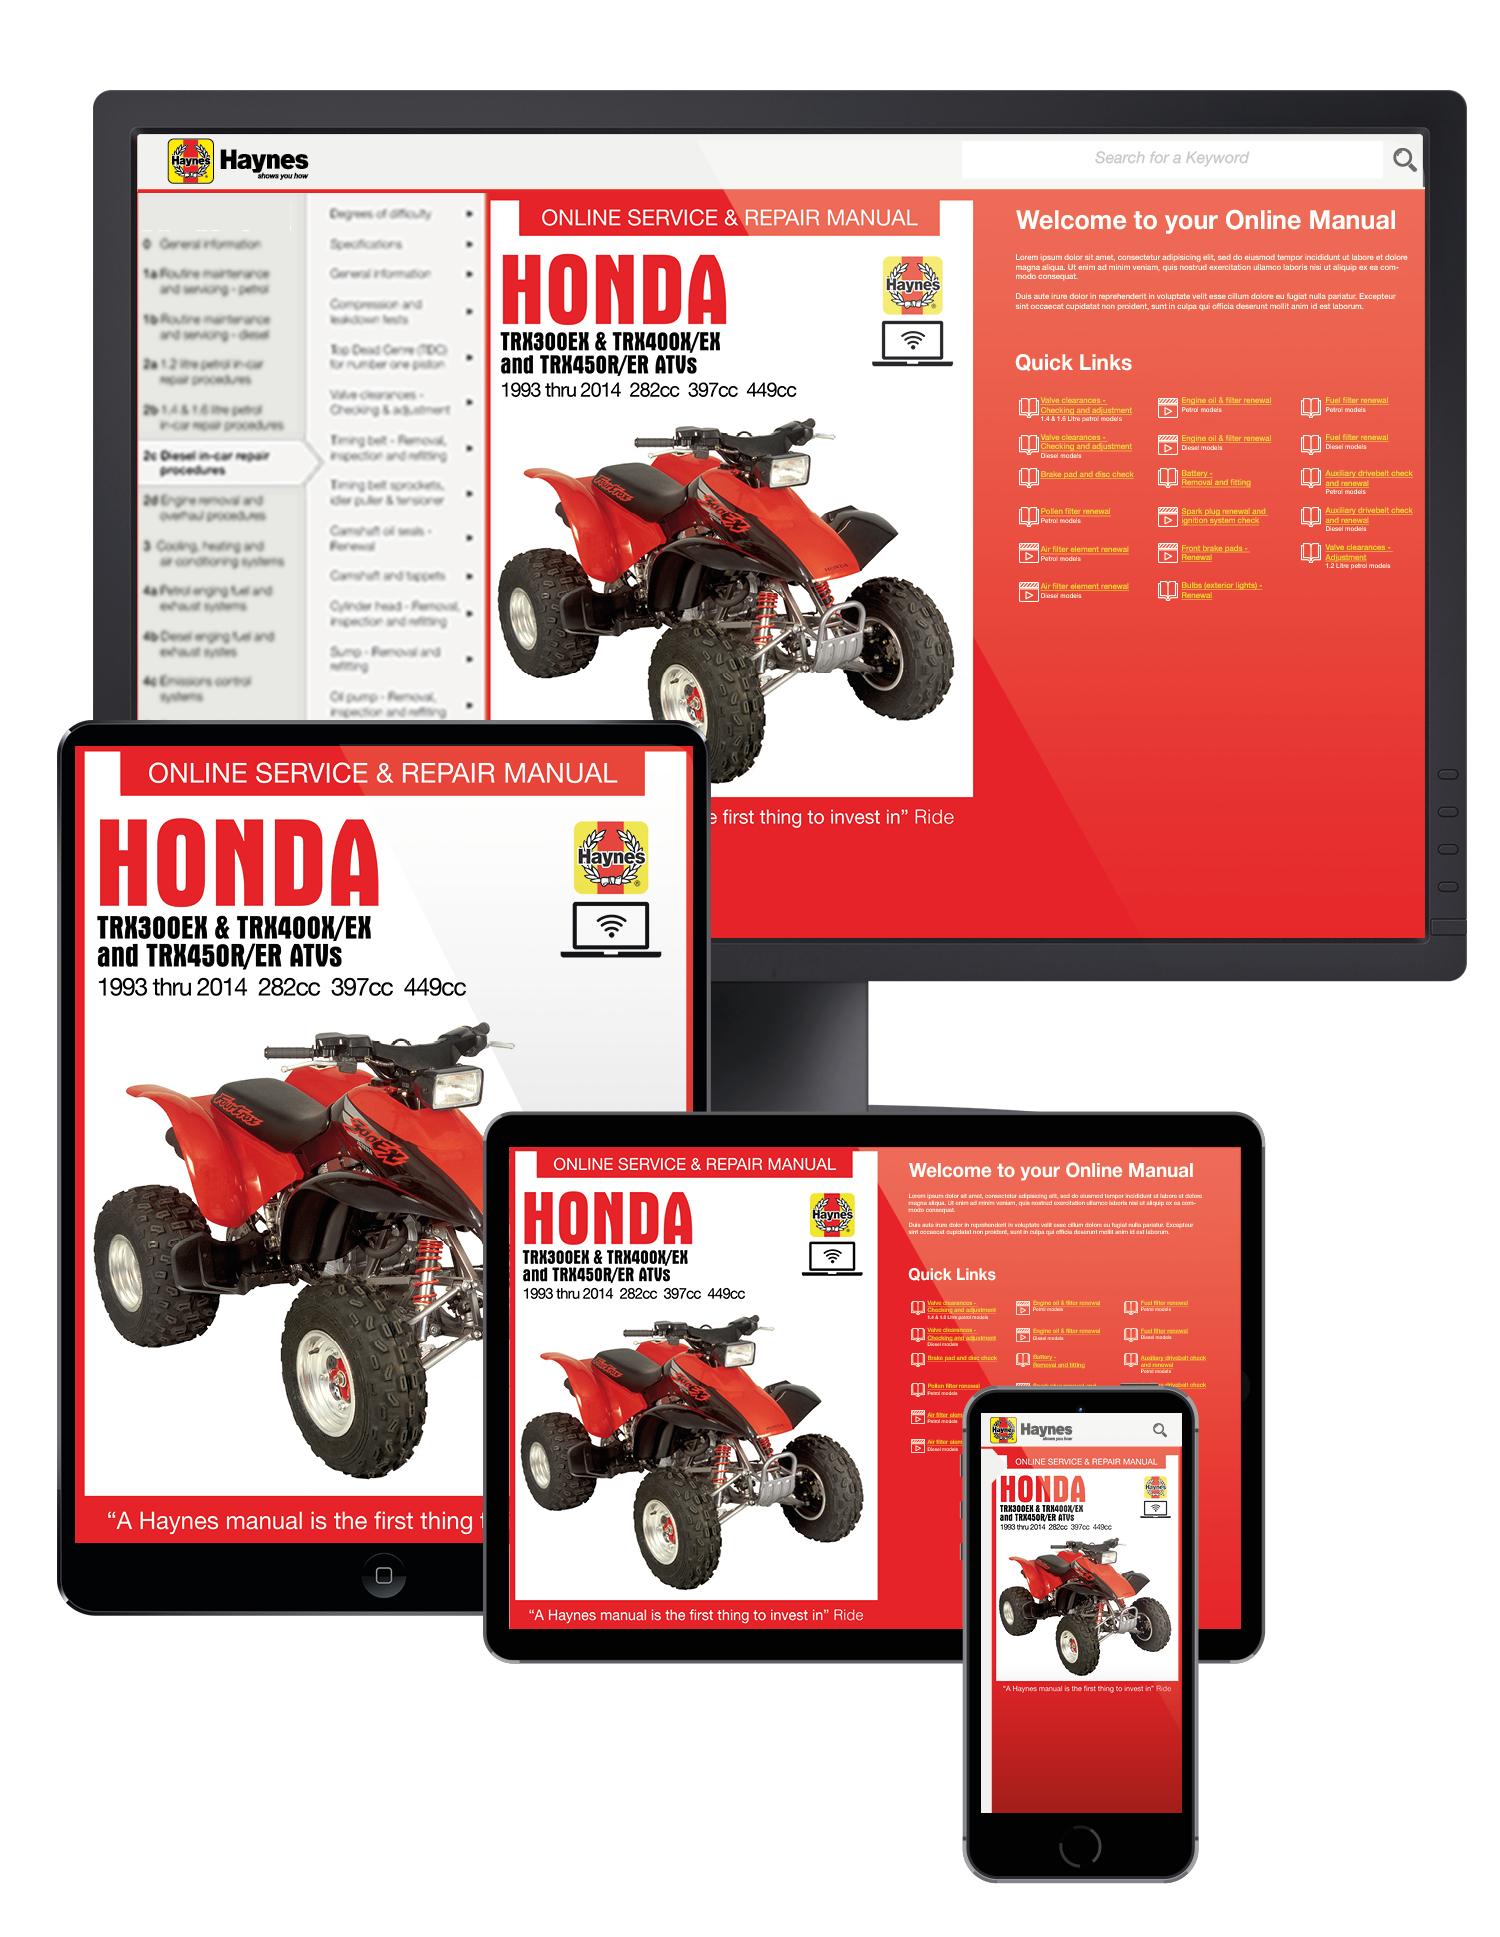 Honda TRX300EX (93-14), TRX400EX (99-14), TRX400X (09-14), TRX450R (04-14) & TRX450ER (06-14) ATV Haynes Online Manual